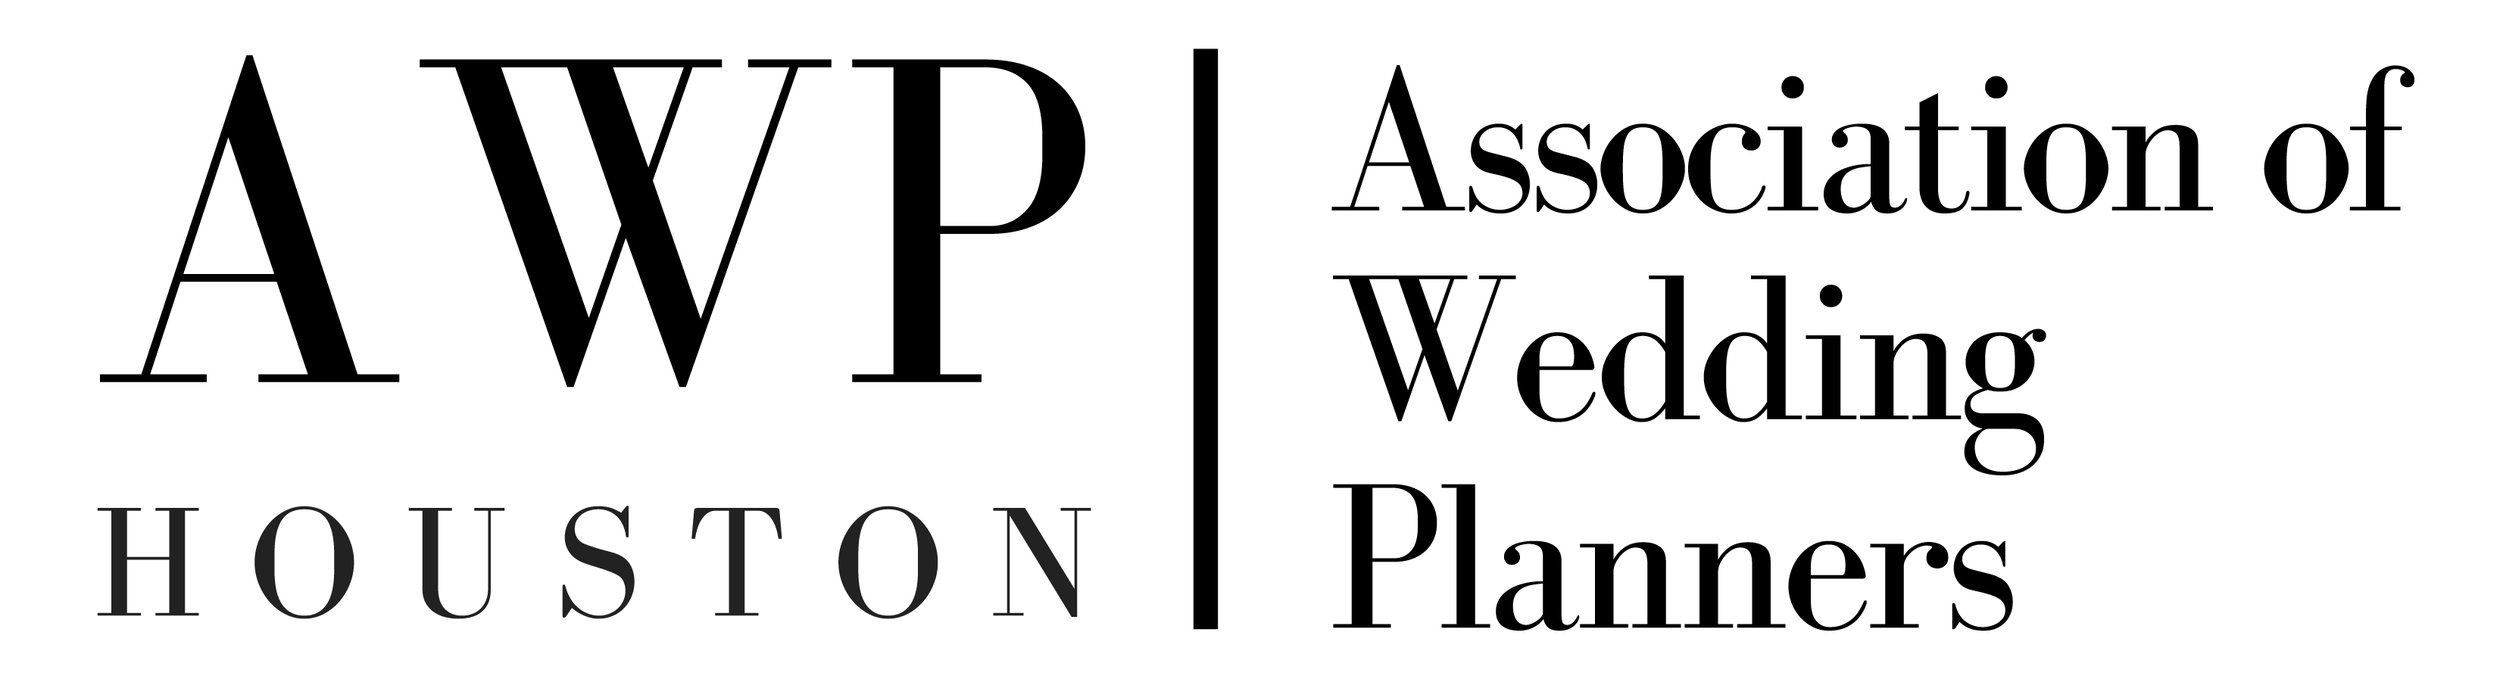 Association of Wedding Planners -  LOGO - JPG.jpg